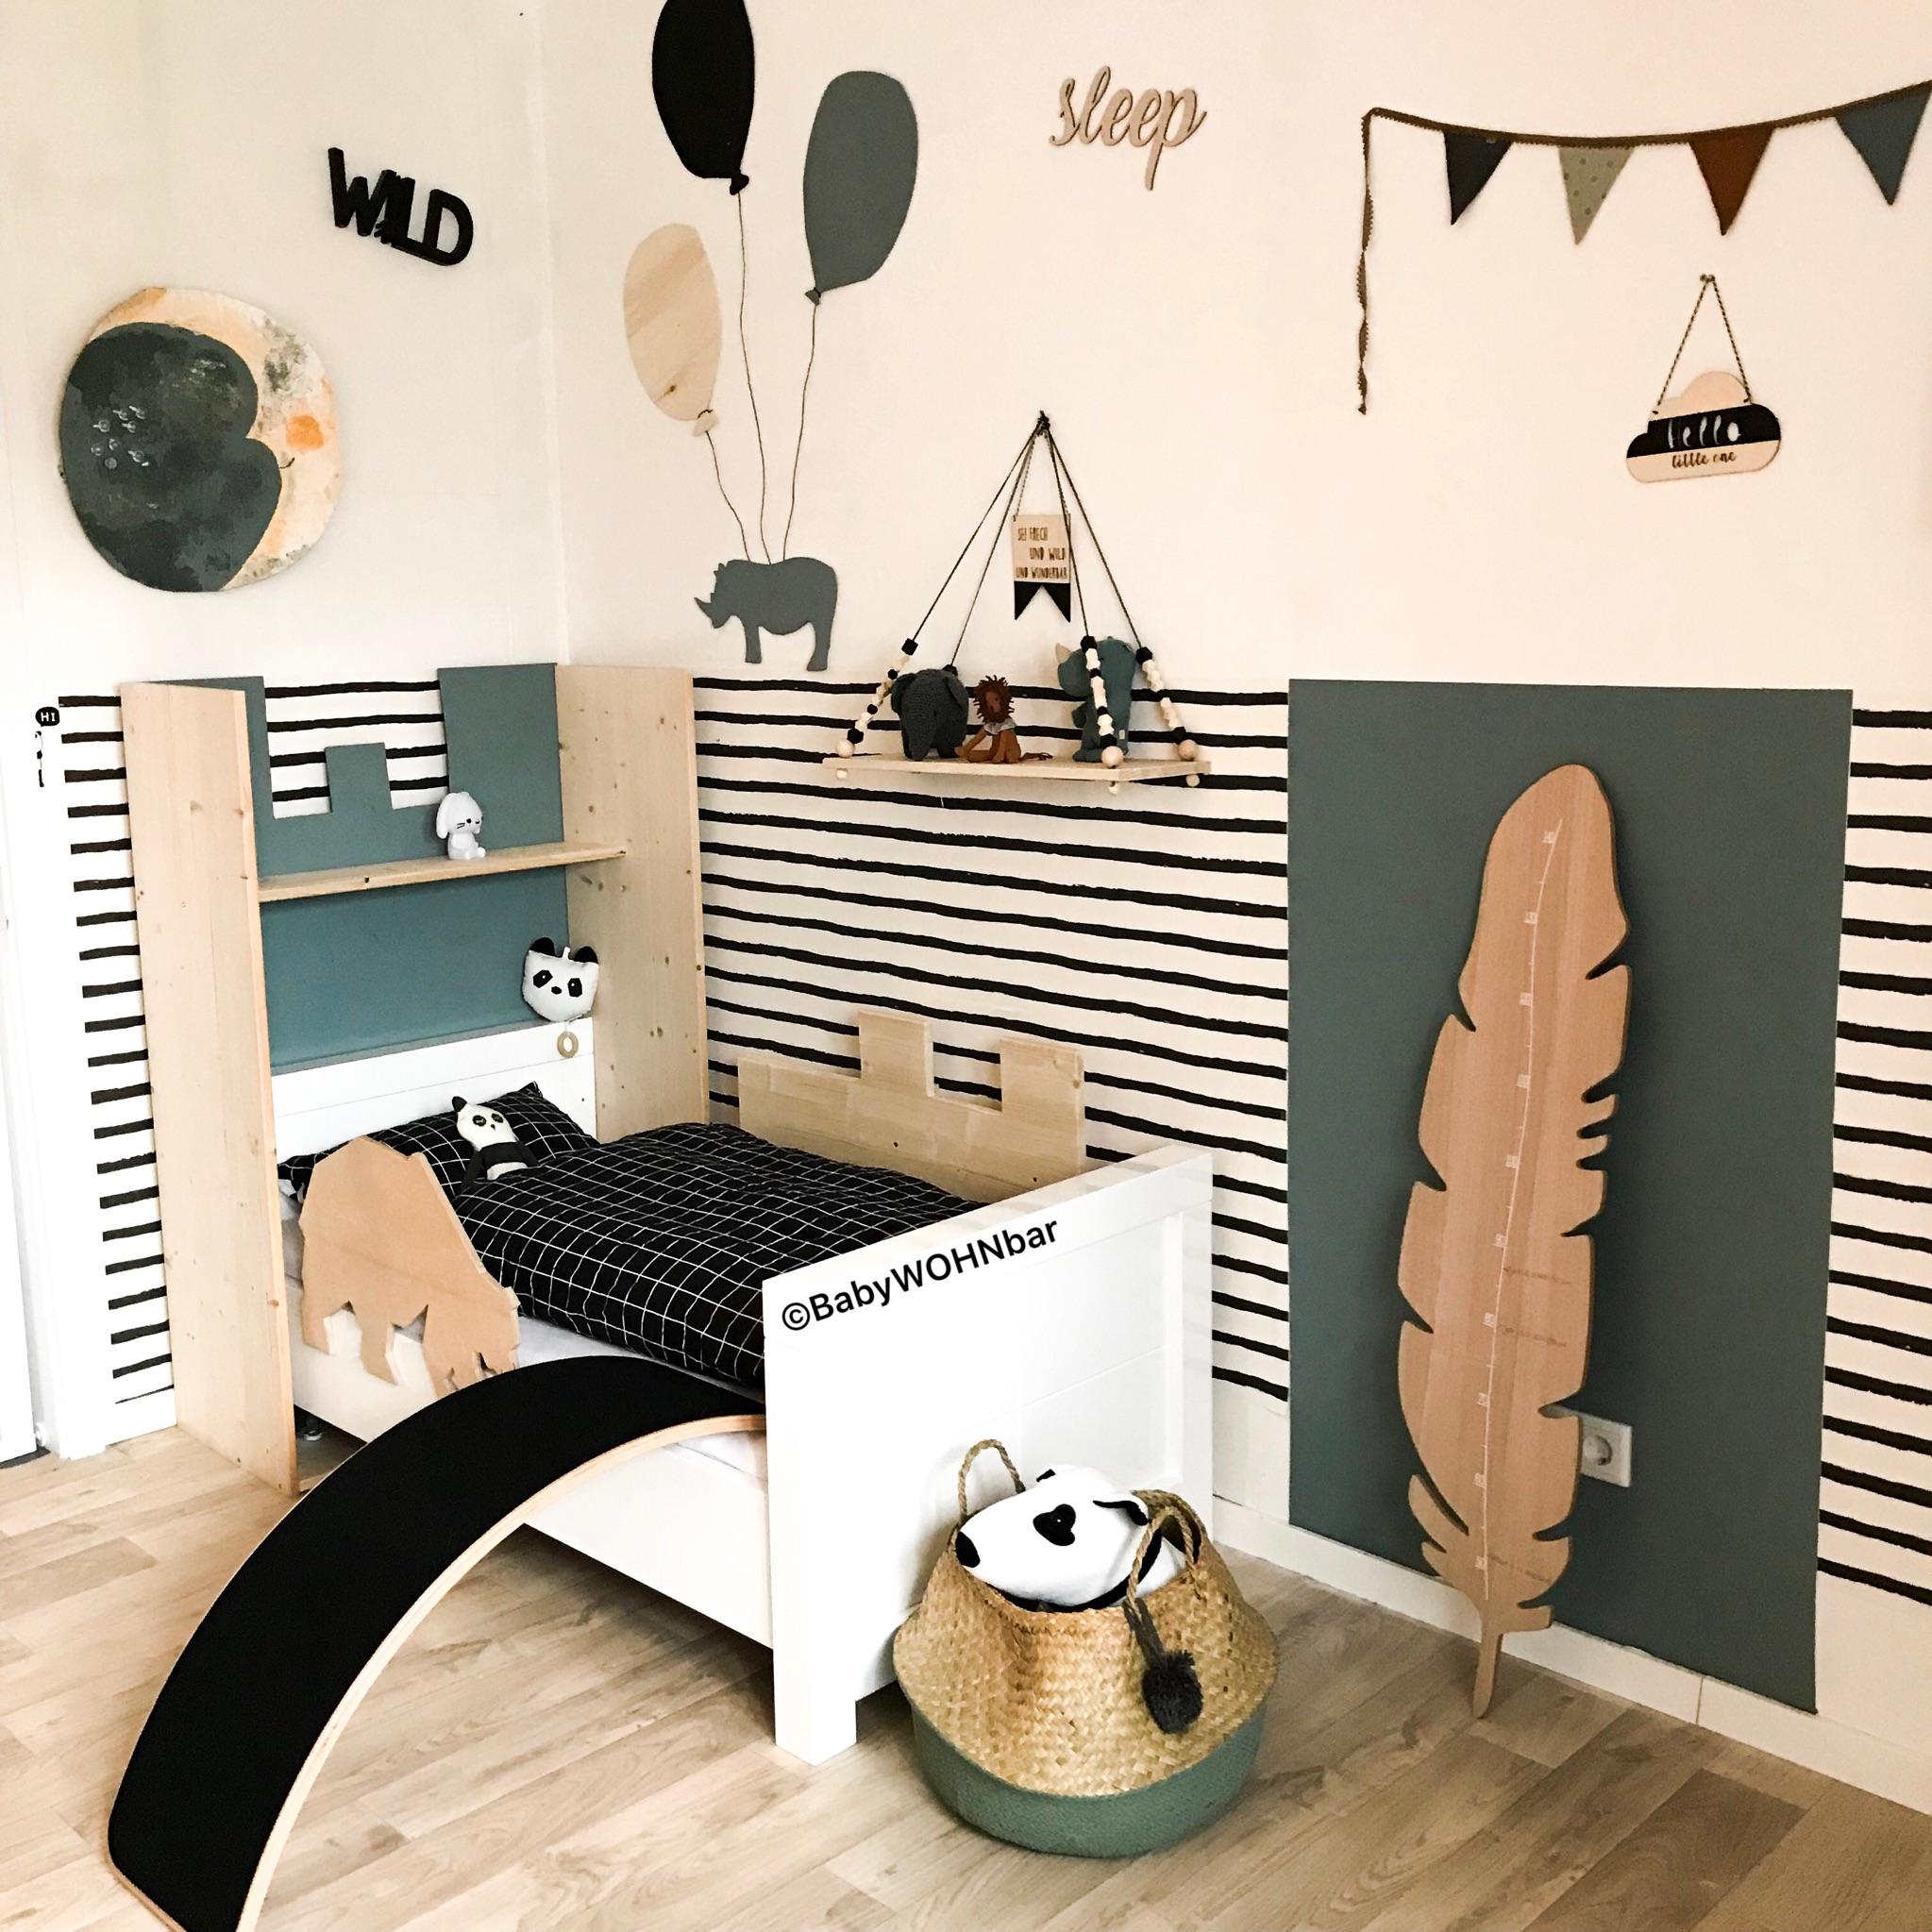 Full Size of Kinderbett Diy Ritterburg Bett Aka Brenburg Wohnzimmer Kinderbett Diy